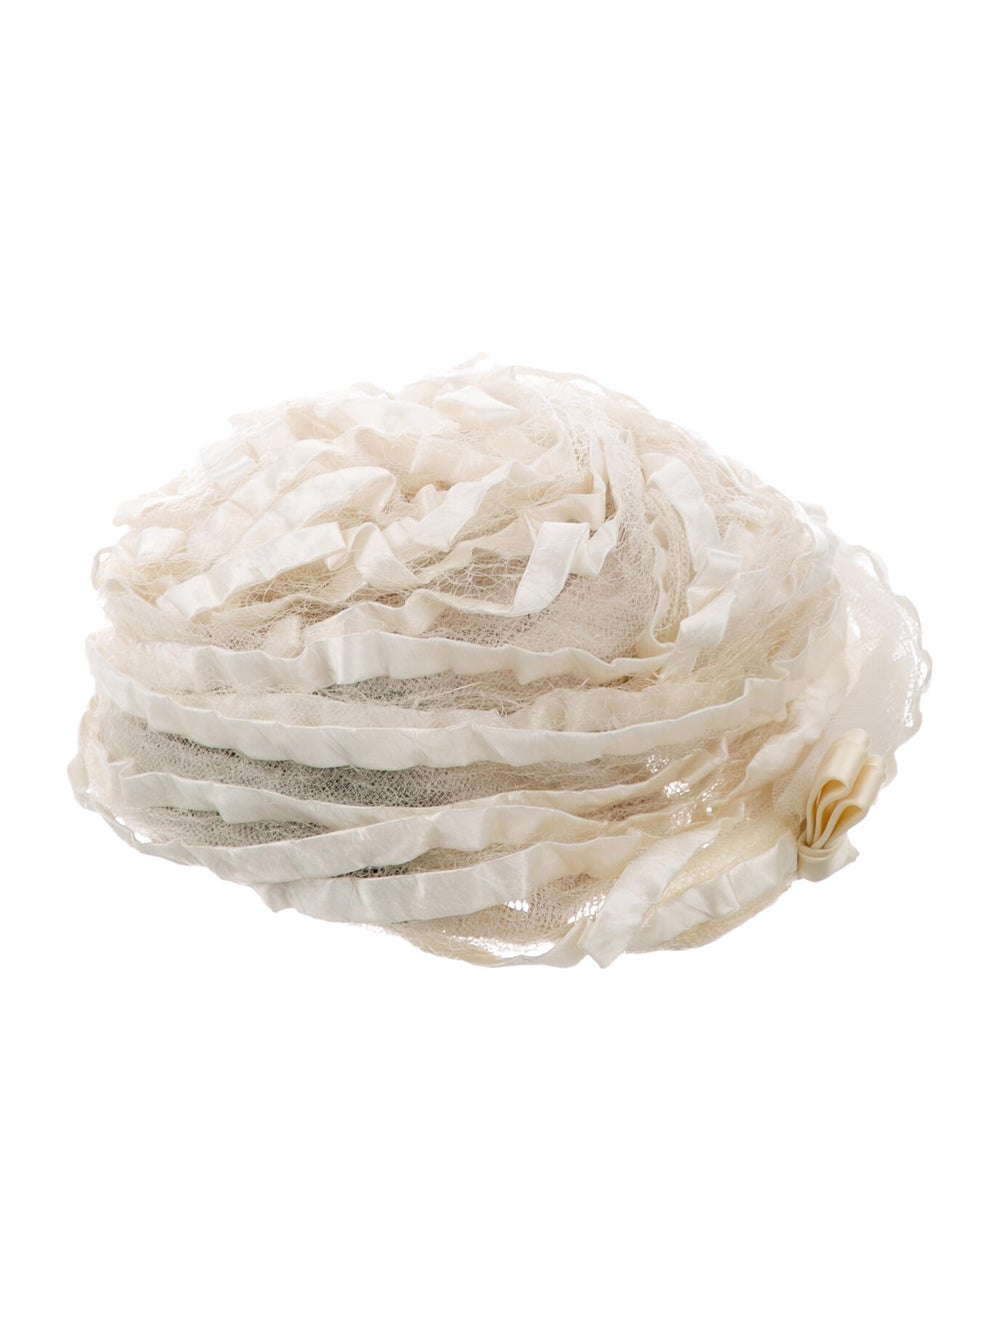 Christian Dior Satin Lace Bucket Hat - image 2